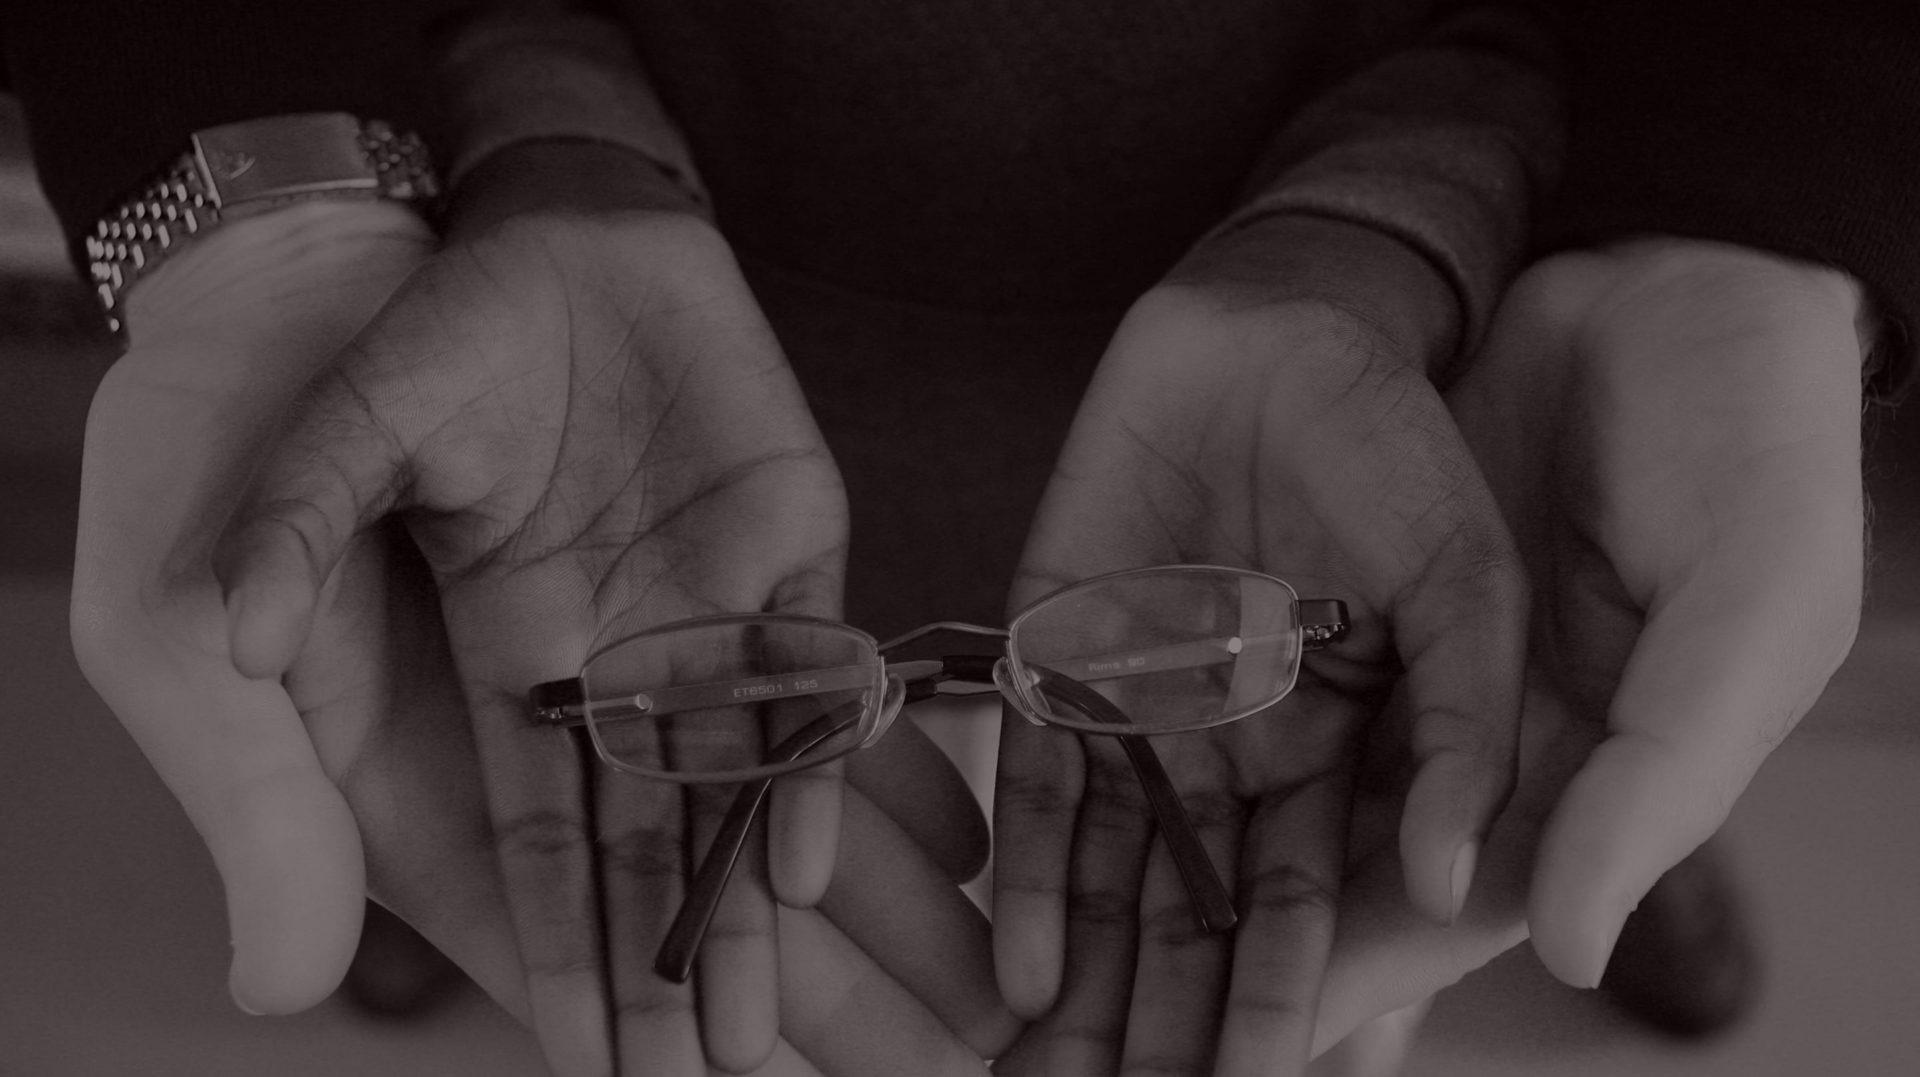 OneSight Beneficiary's Hands